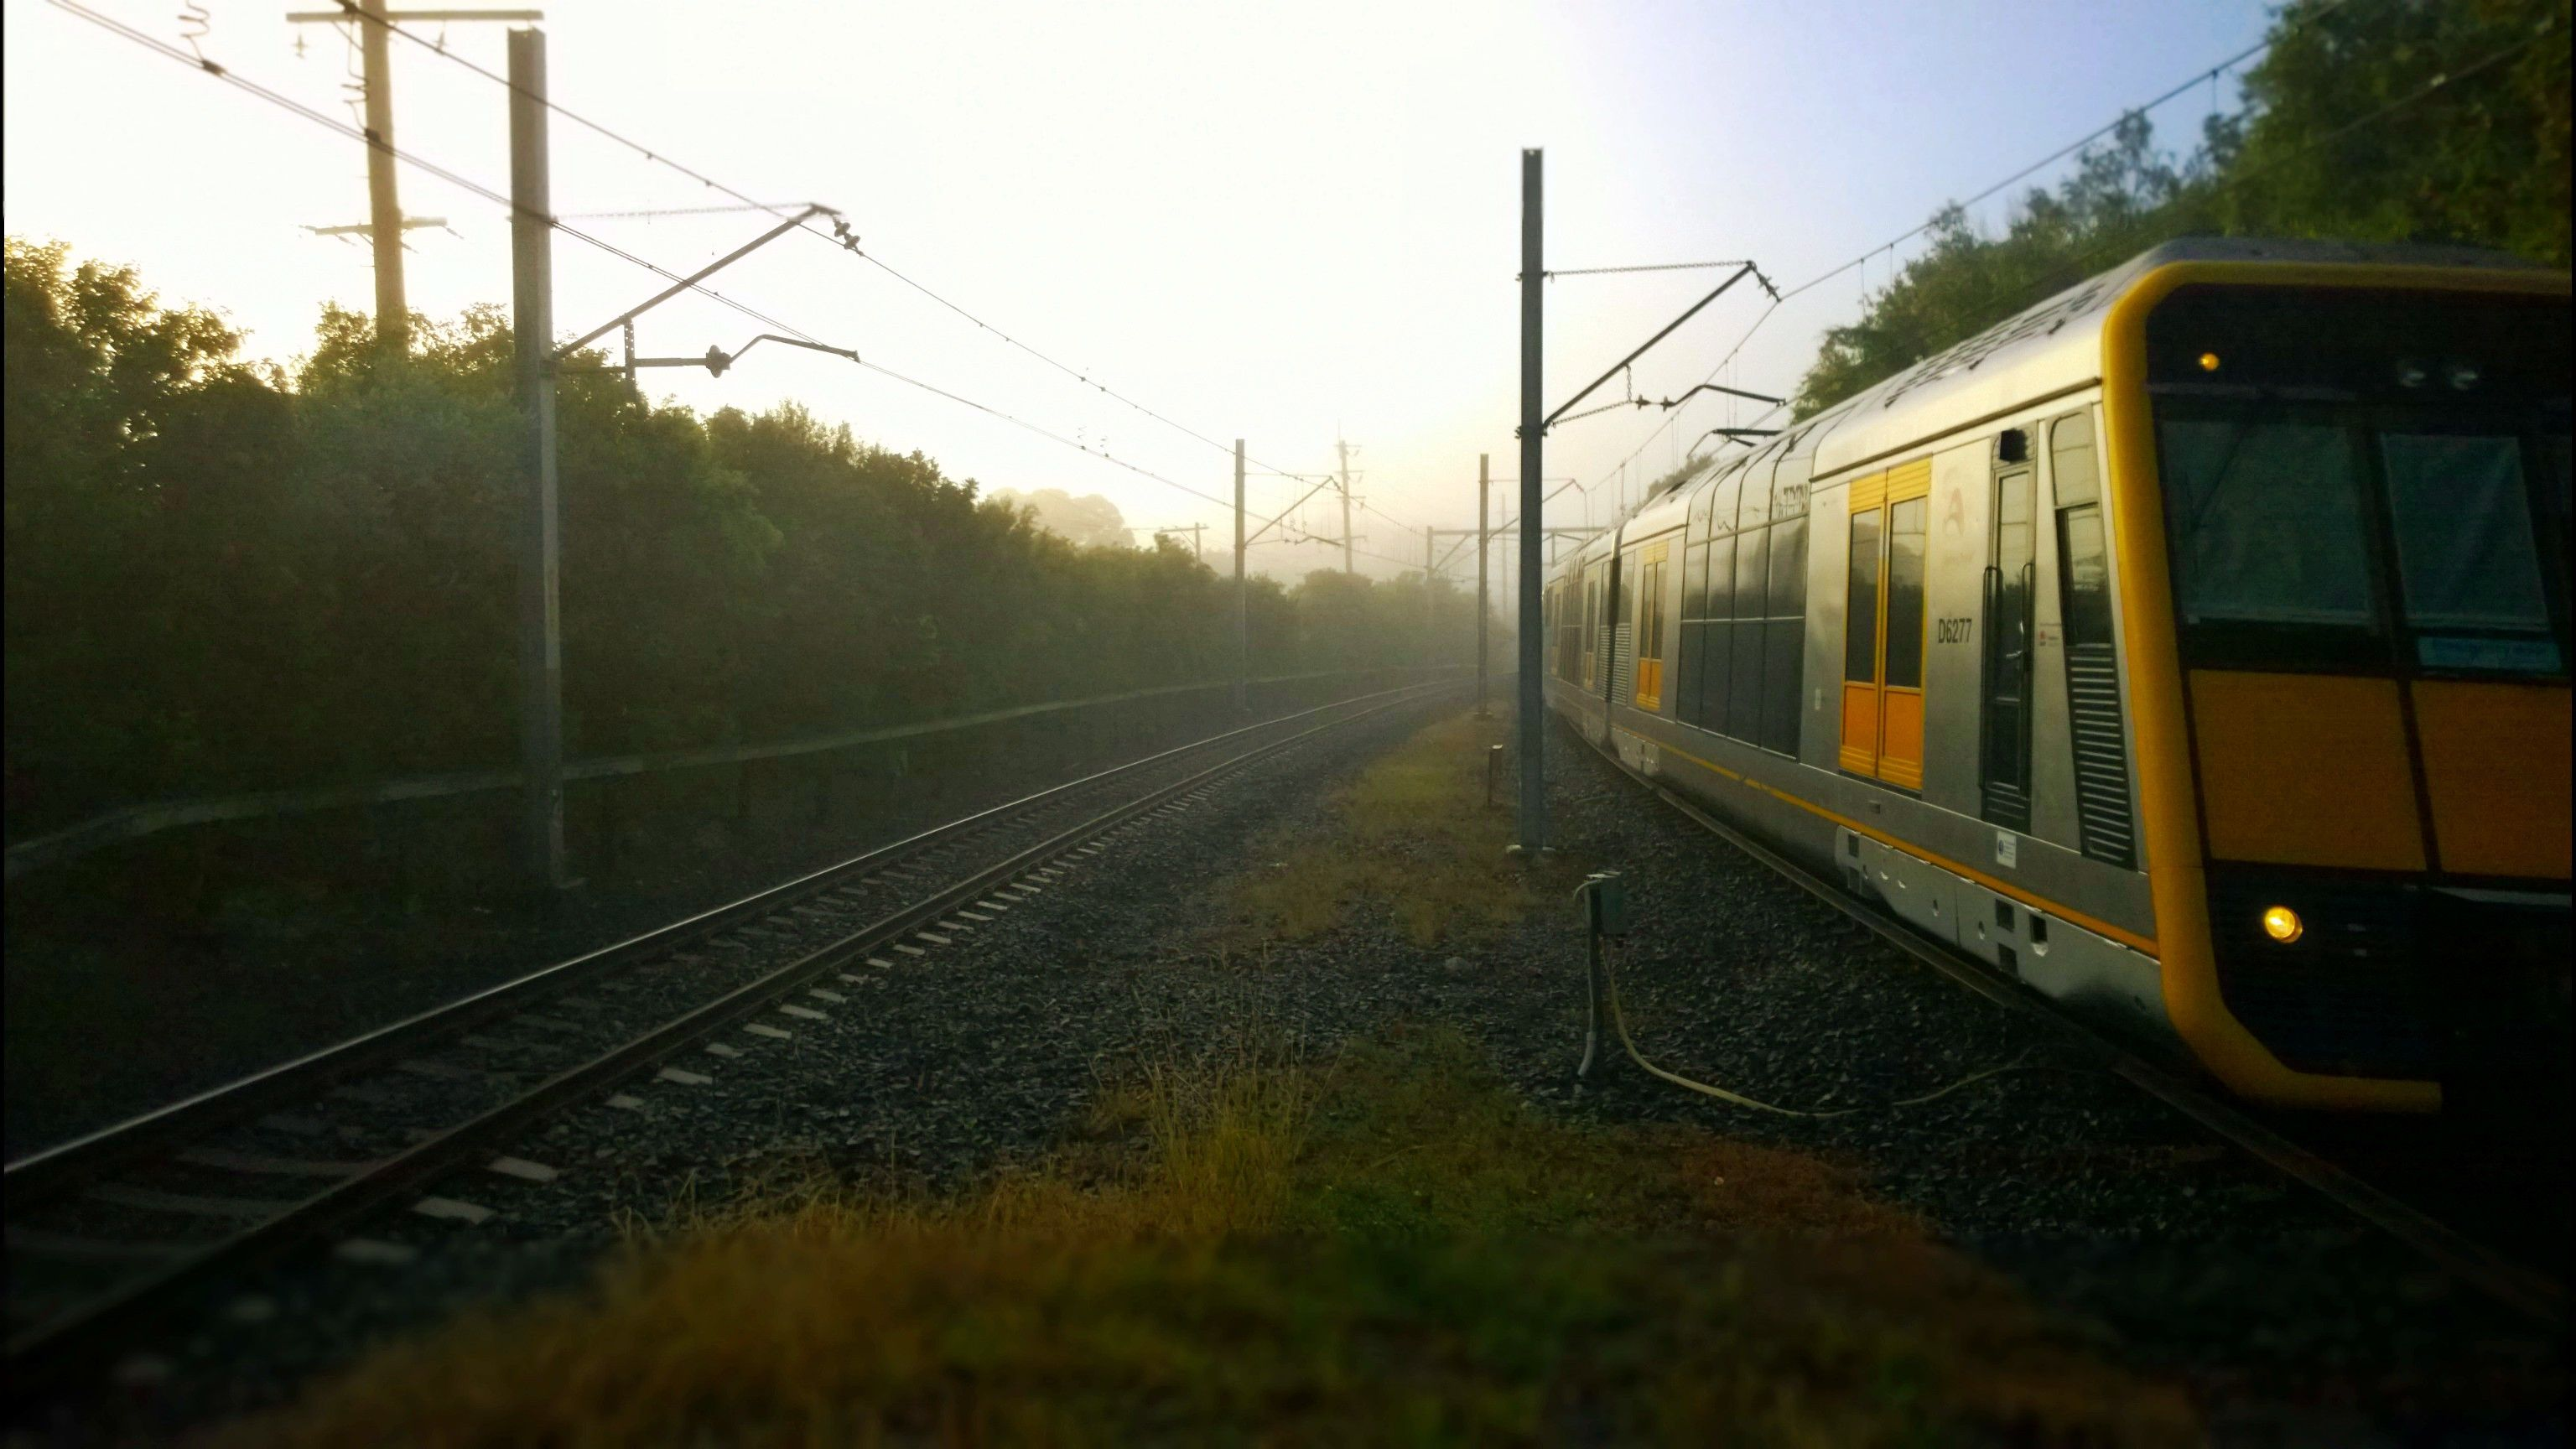 Train... not going my way...